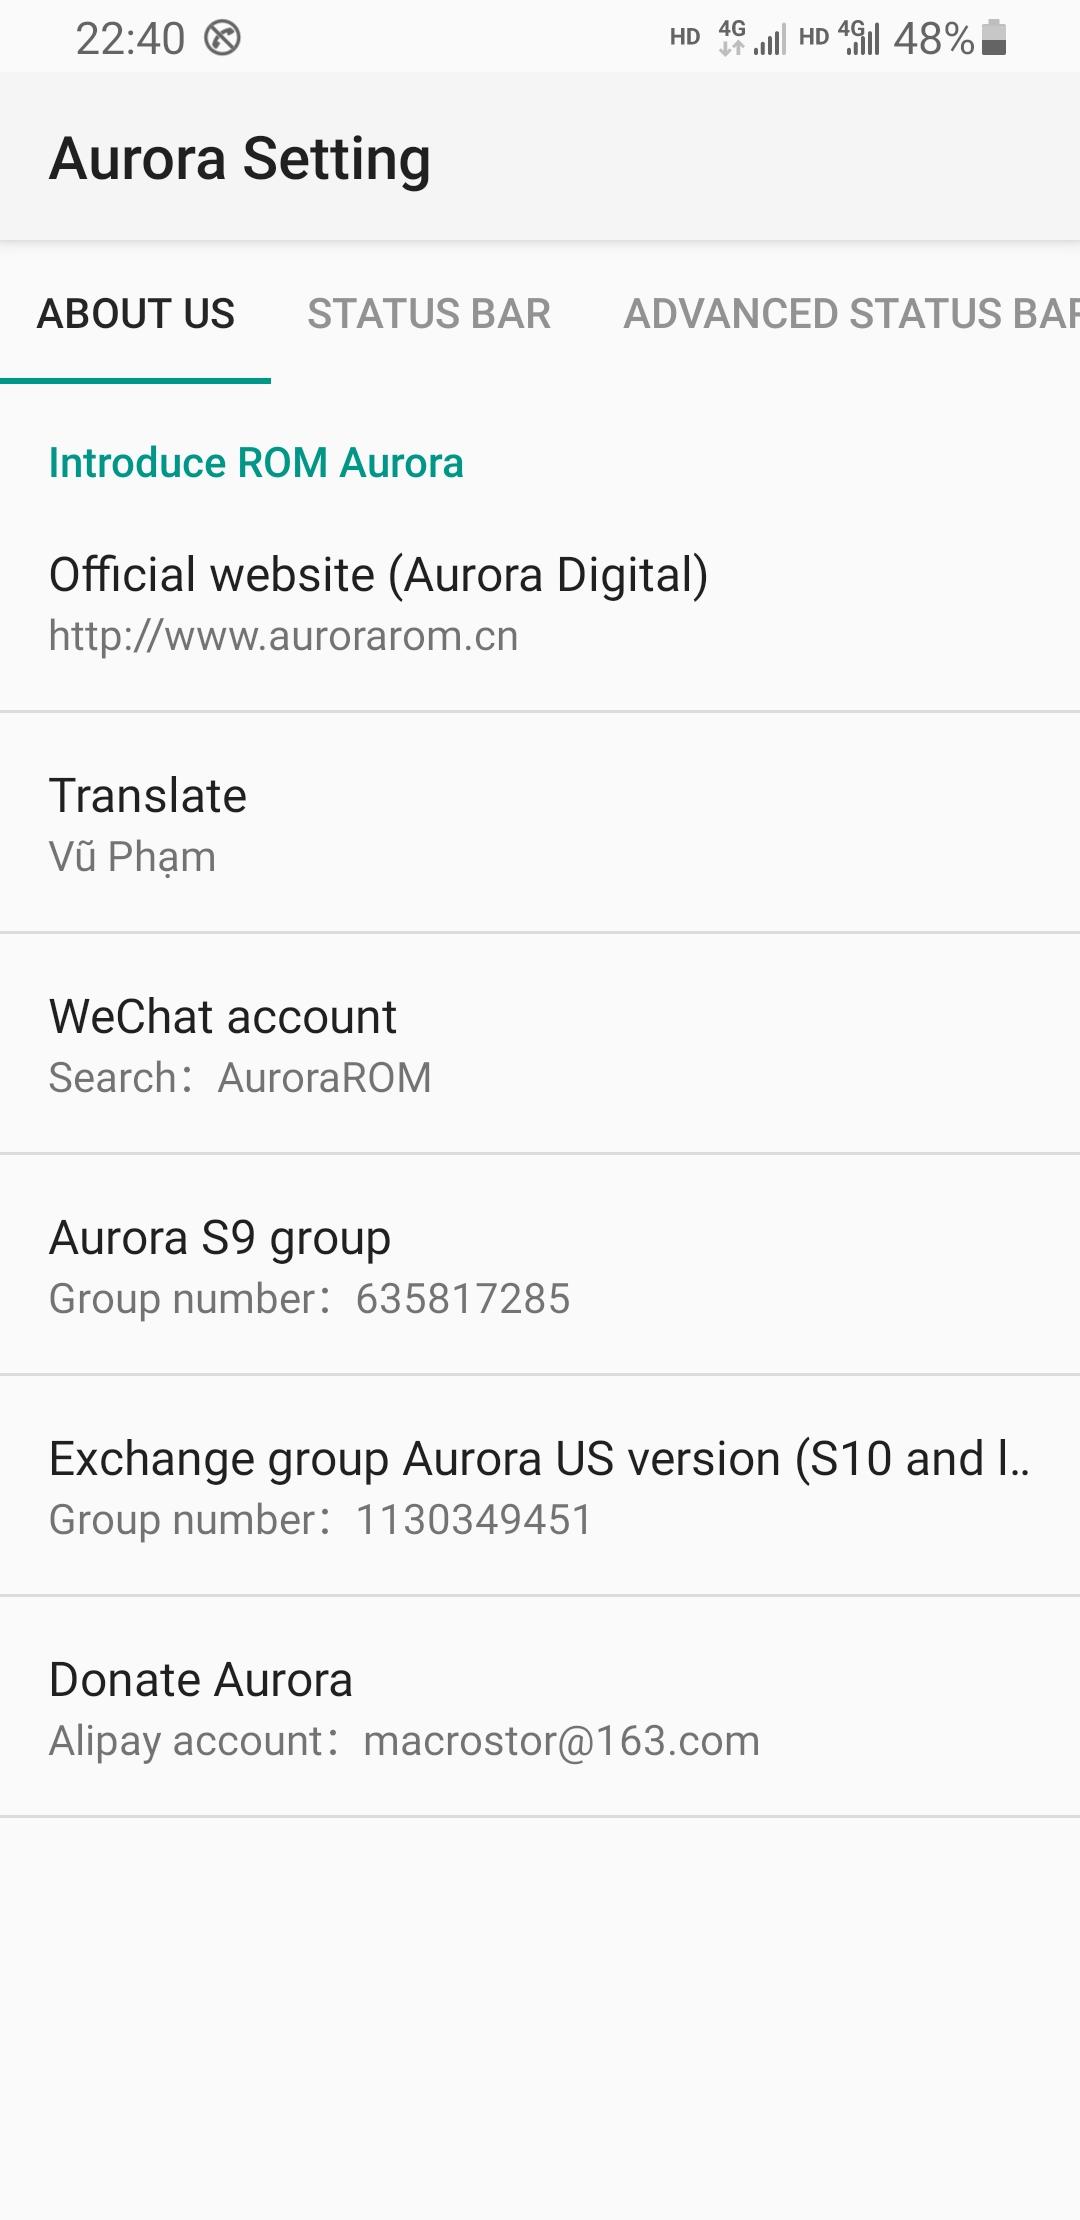 Screenshot_20210519-224047_Aurora Setting.jpg